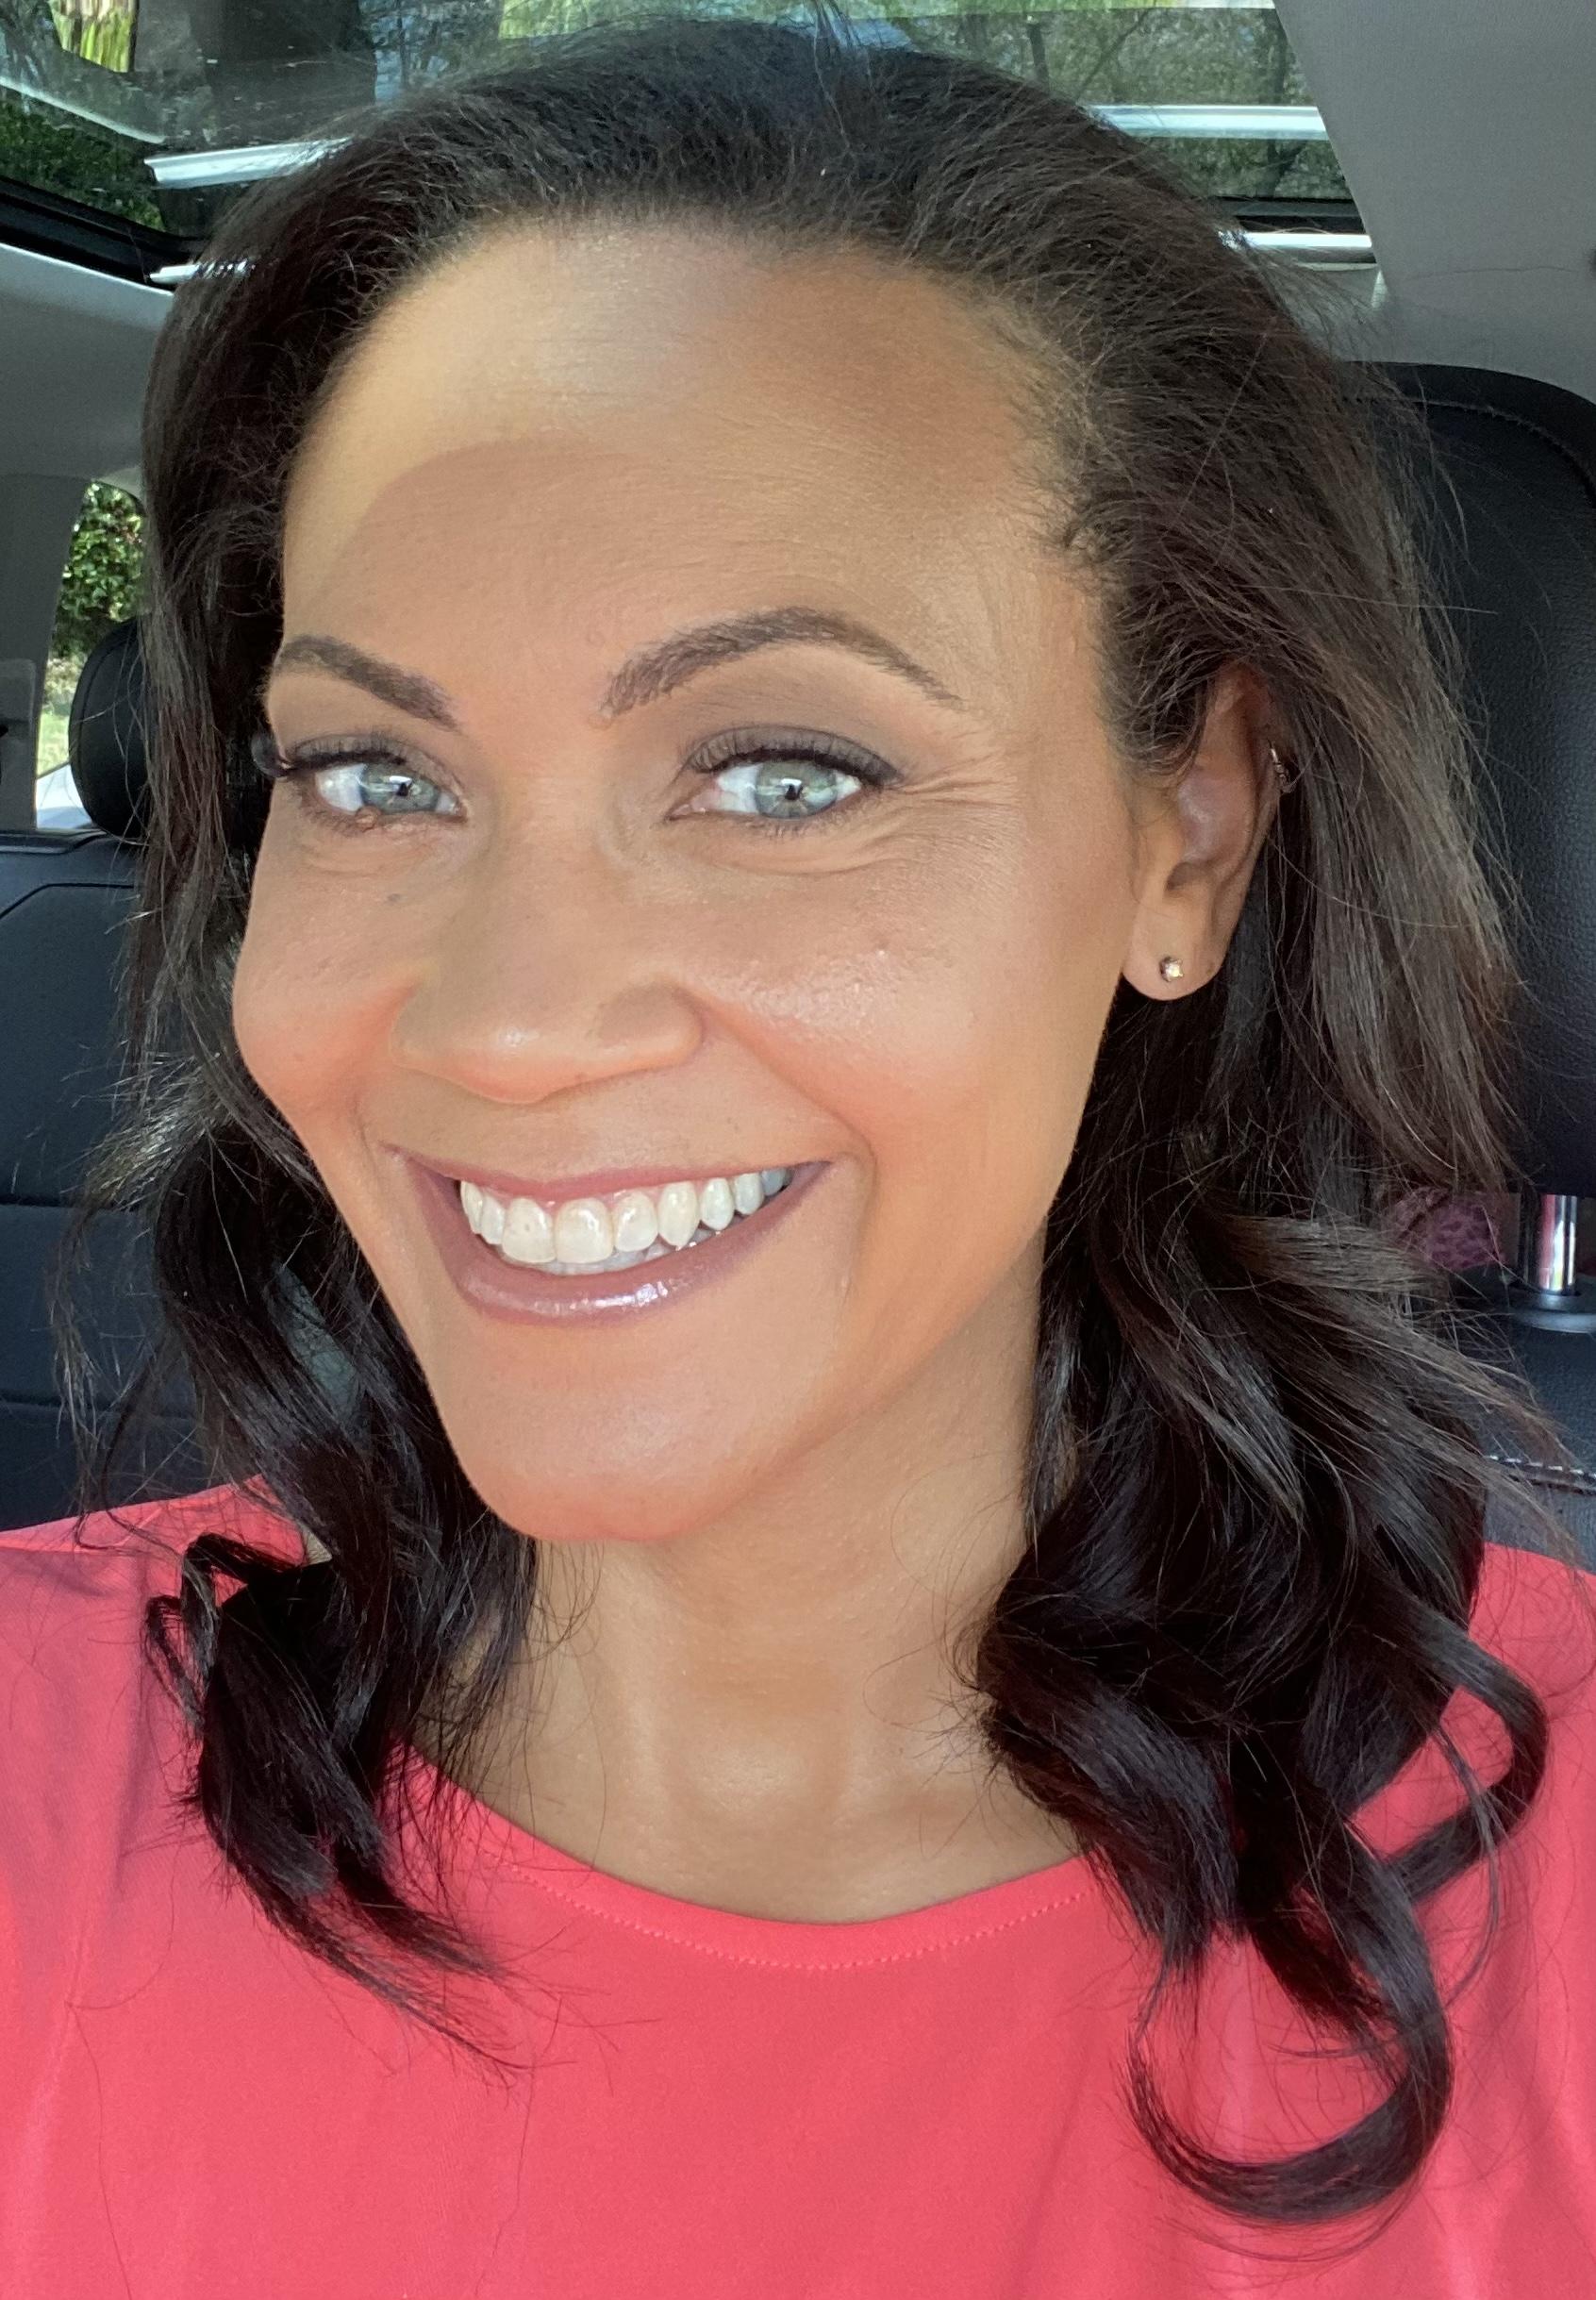 Hera McLeod